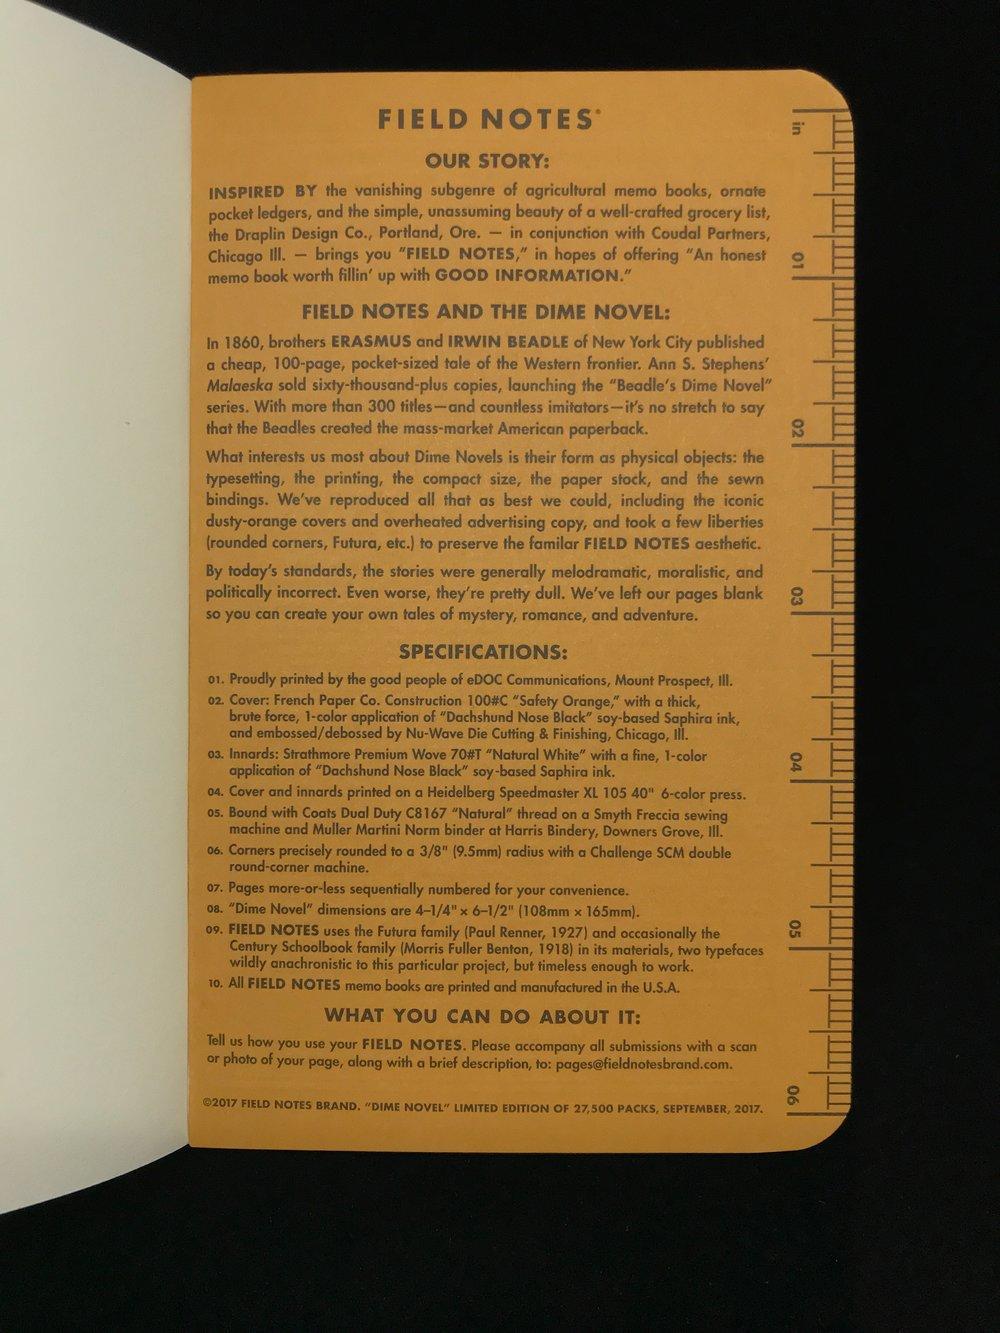 field-notes-dime-novel-6.jpg